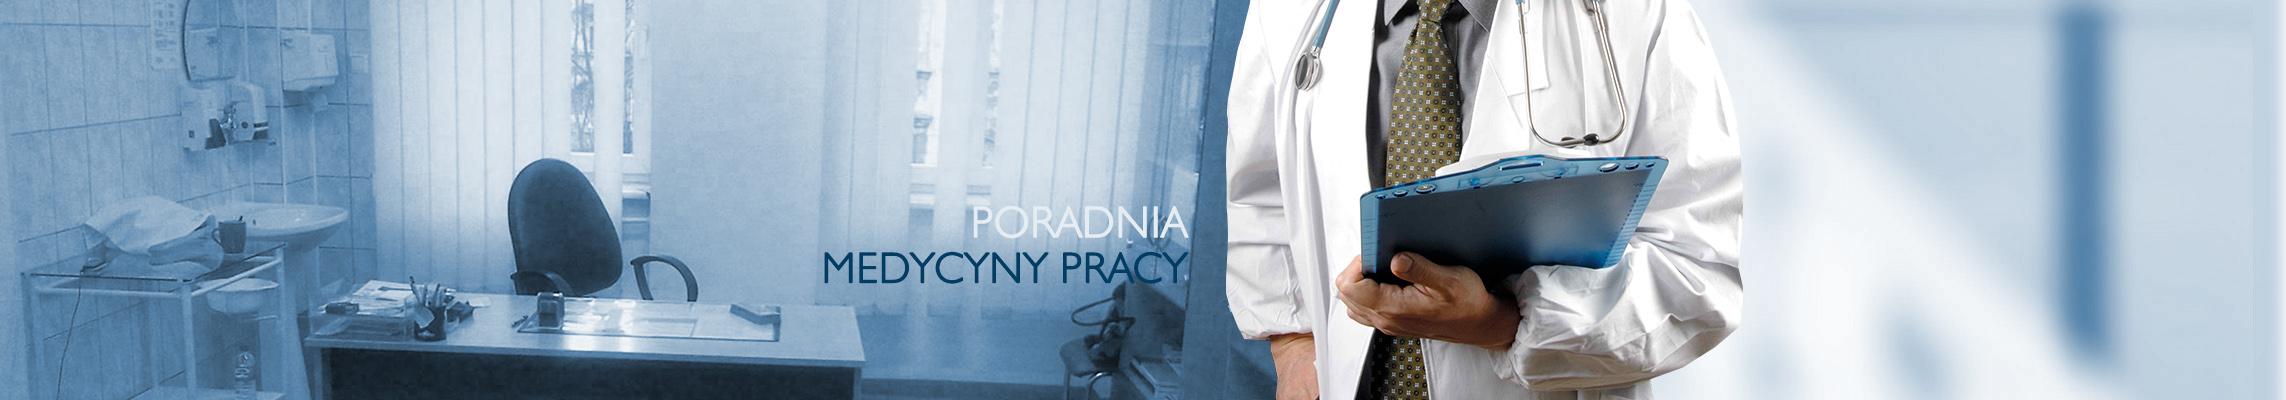 medycyny-pracy